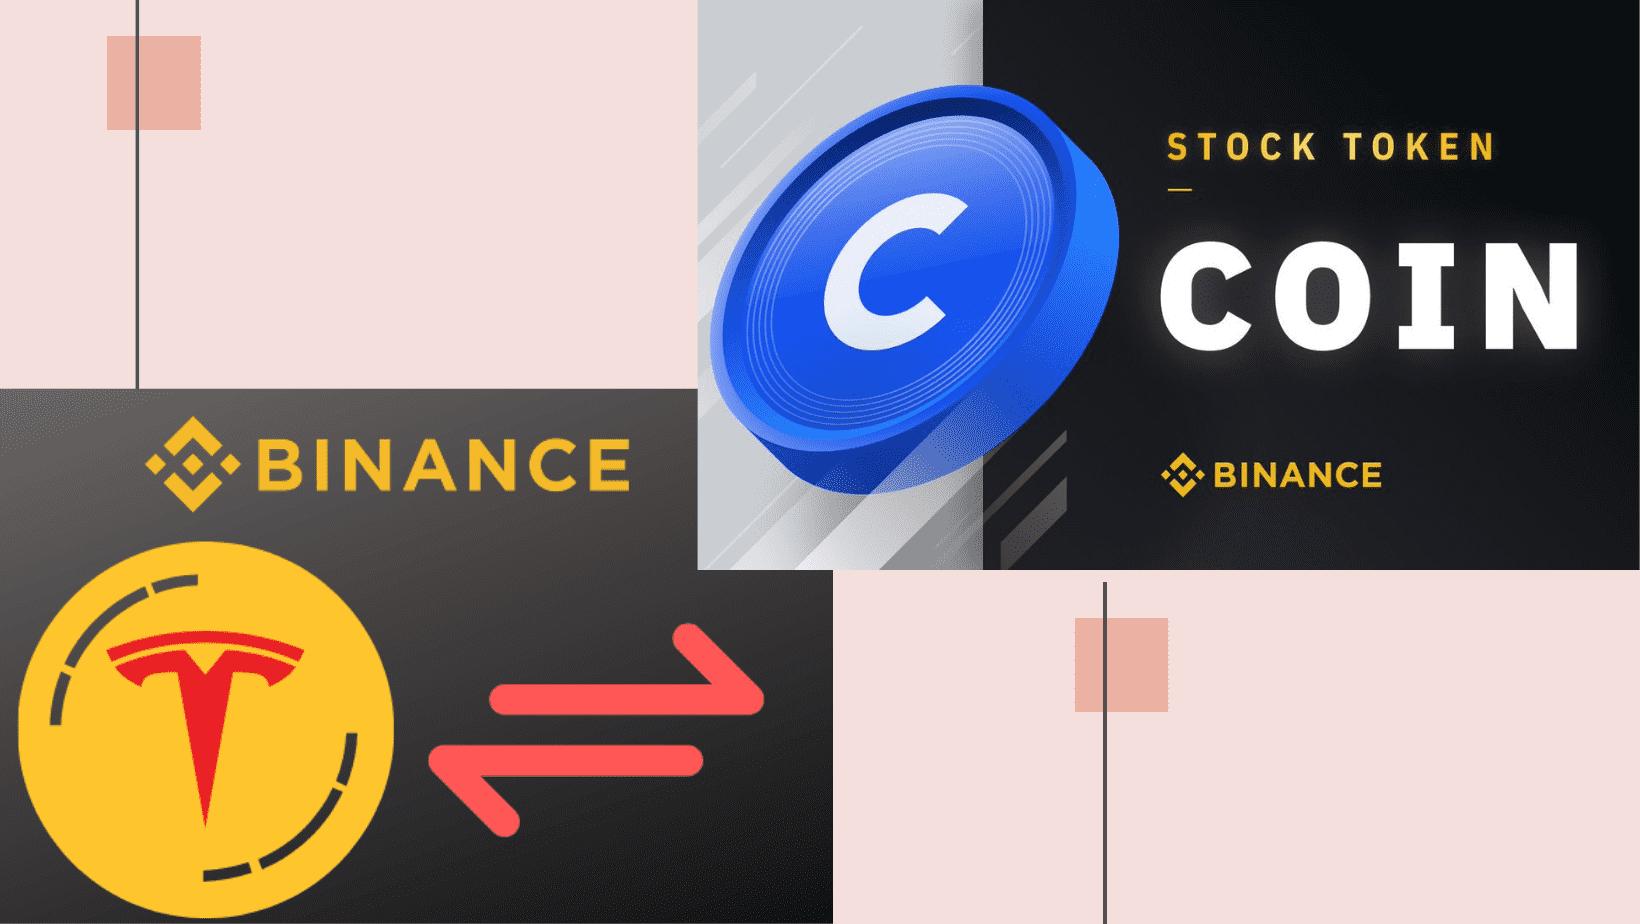 Binance token stock